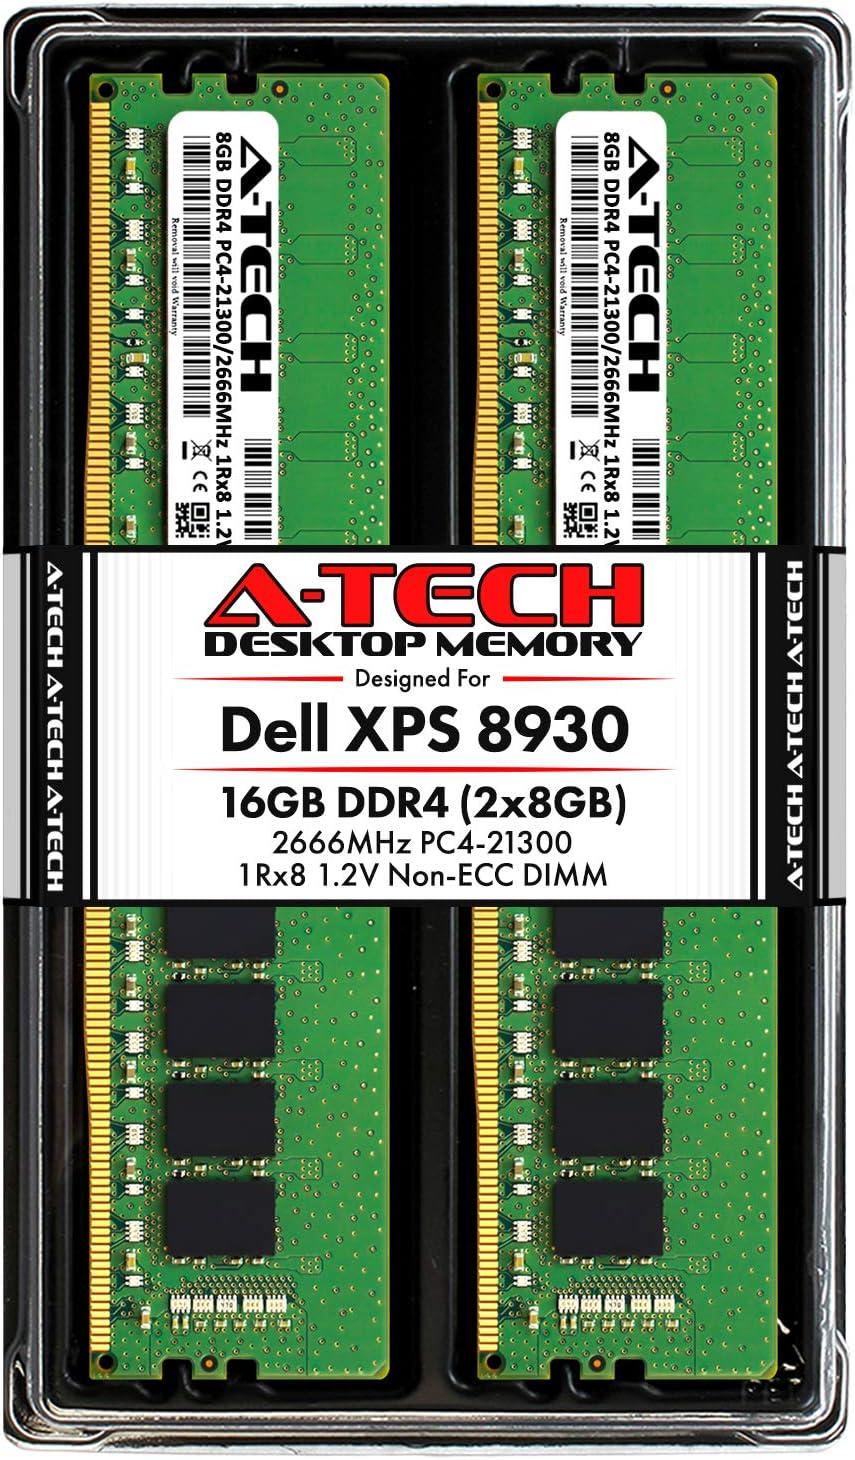 A-Tech 16GB RAM Kit for Dell XPS 8930 Tower - (2 x 8GB) DDR4 2666MHz PC4-21300 Non-ECC DIMM Desktop Memory Upgrade